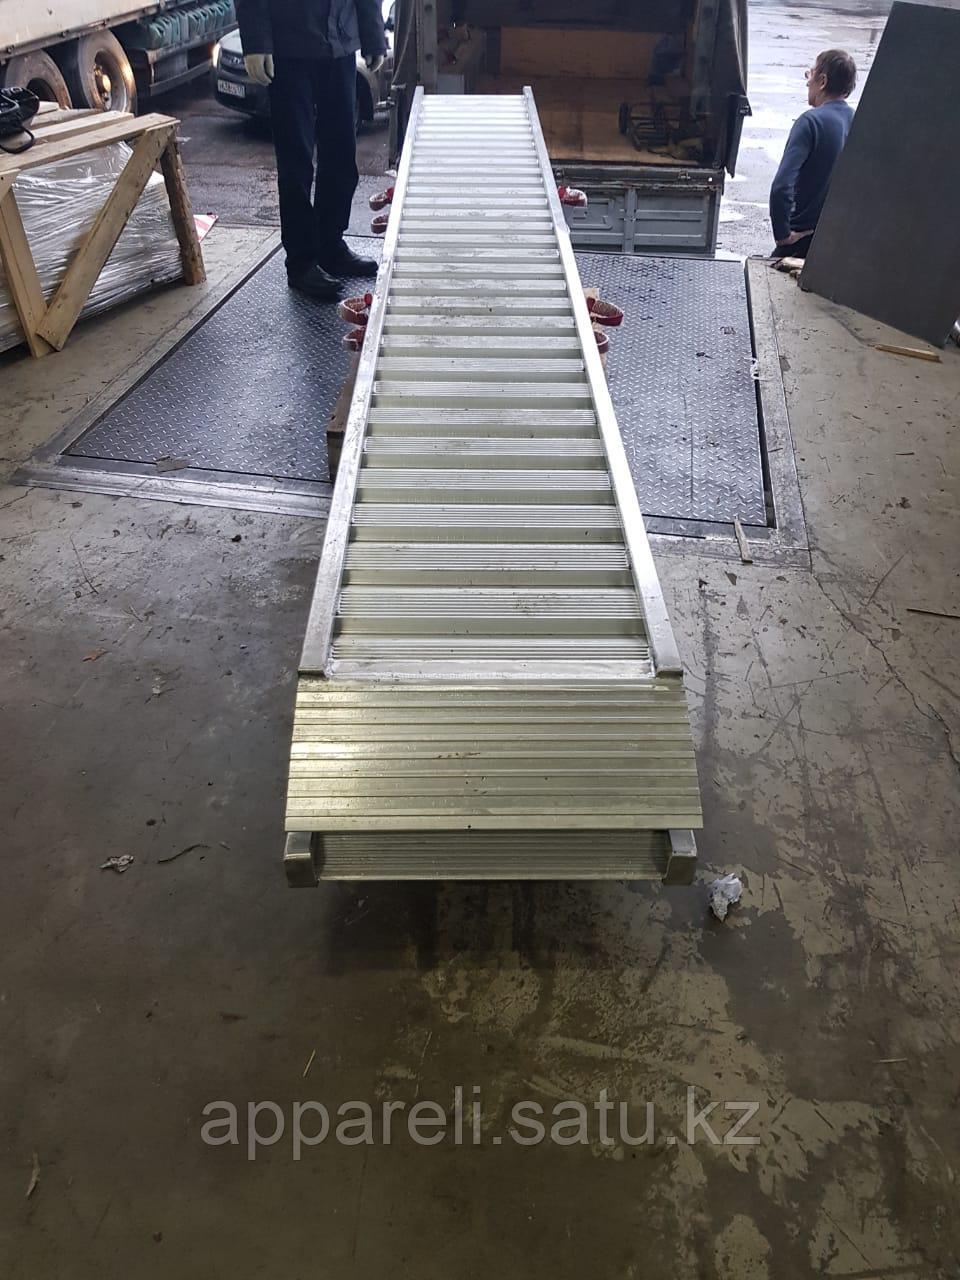 Аппарели от производителя для спецтехники 7,5 тонн, 4500 мм